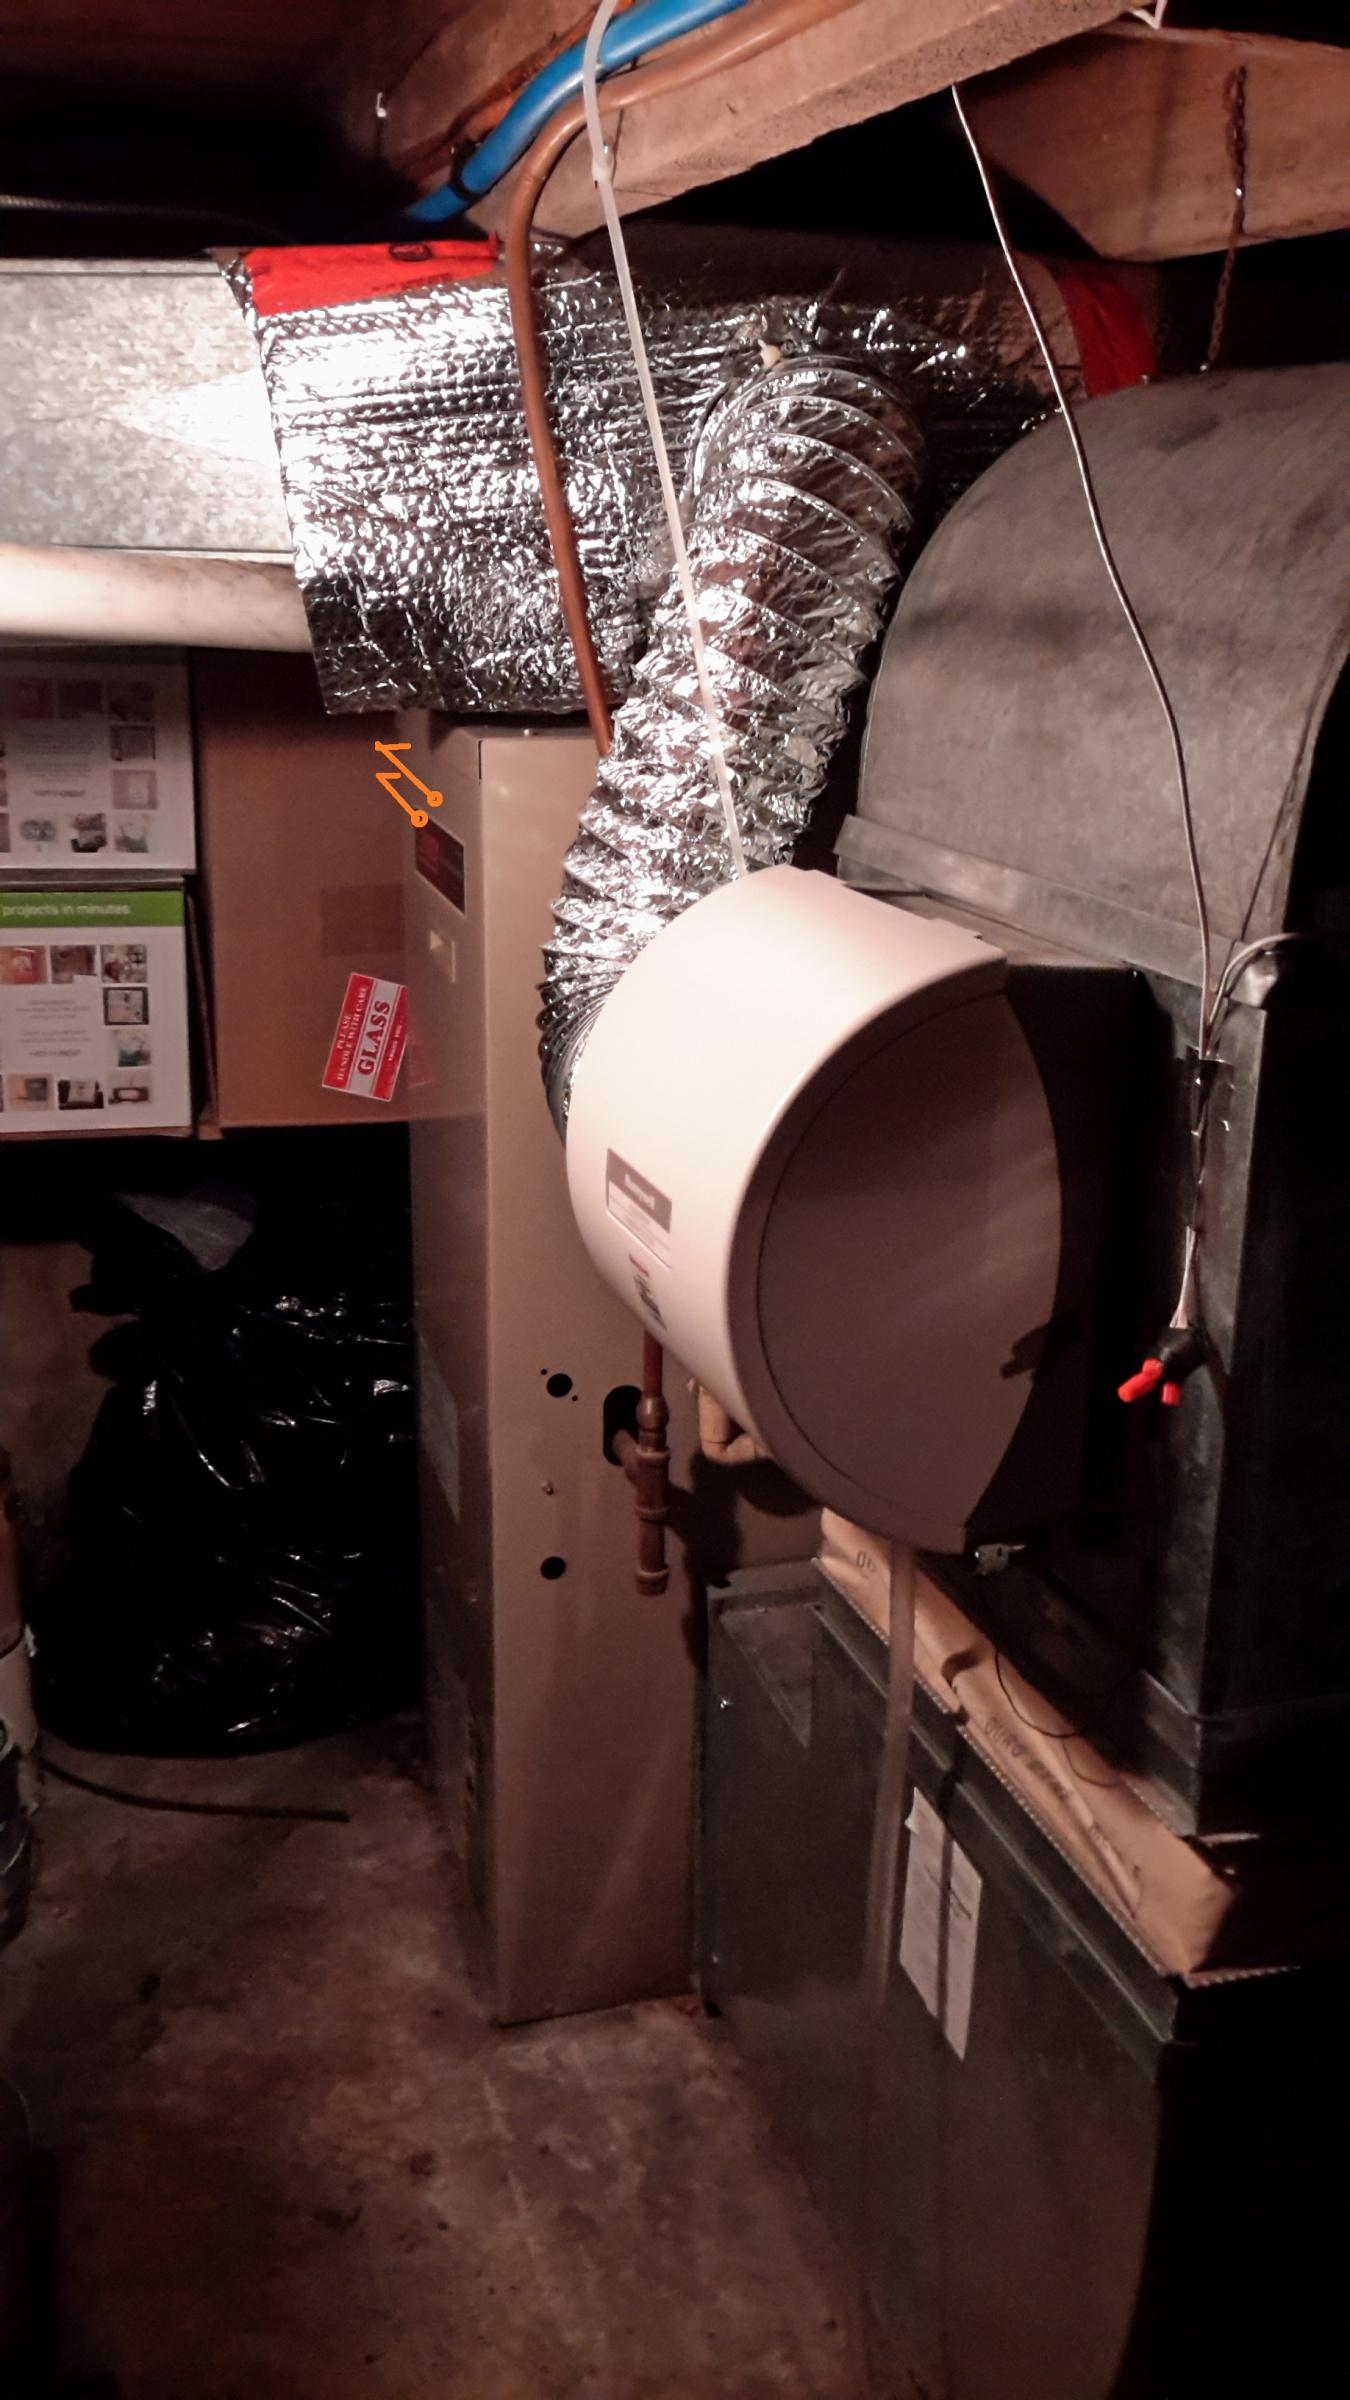 Seeking advice on central AC installation-furnace.jpg